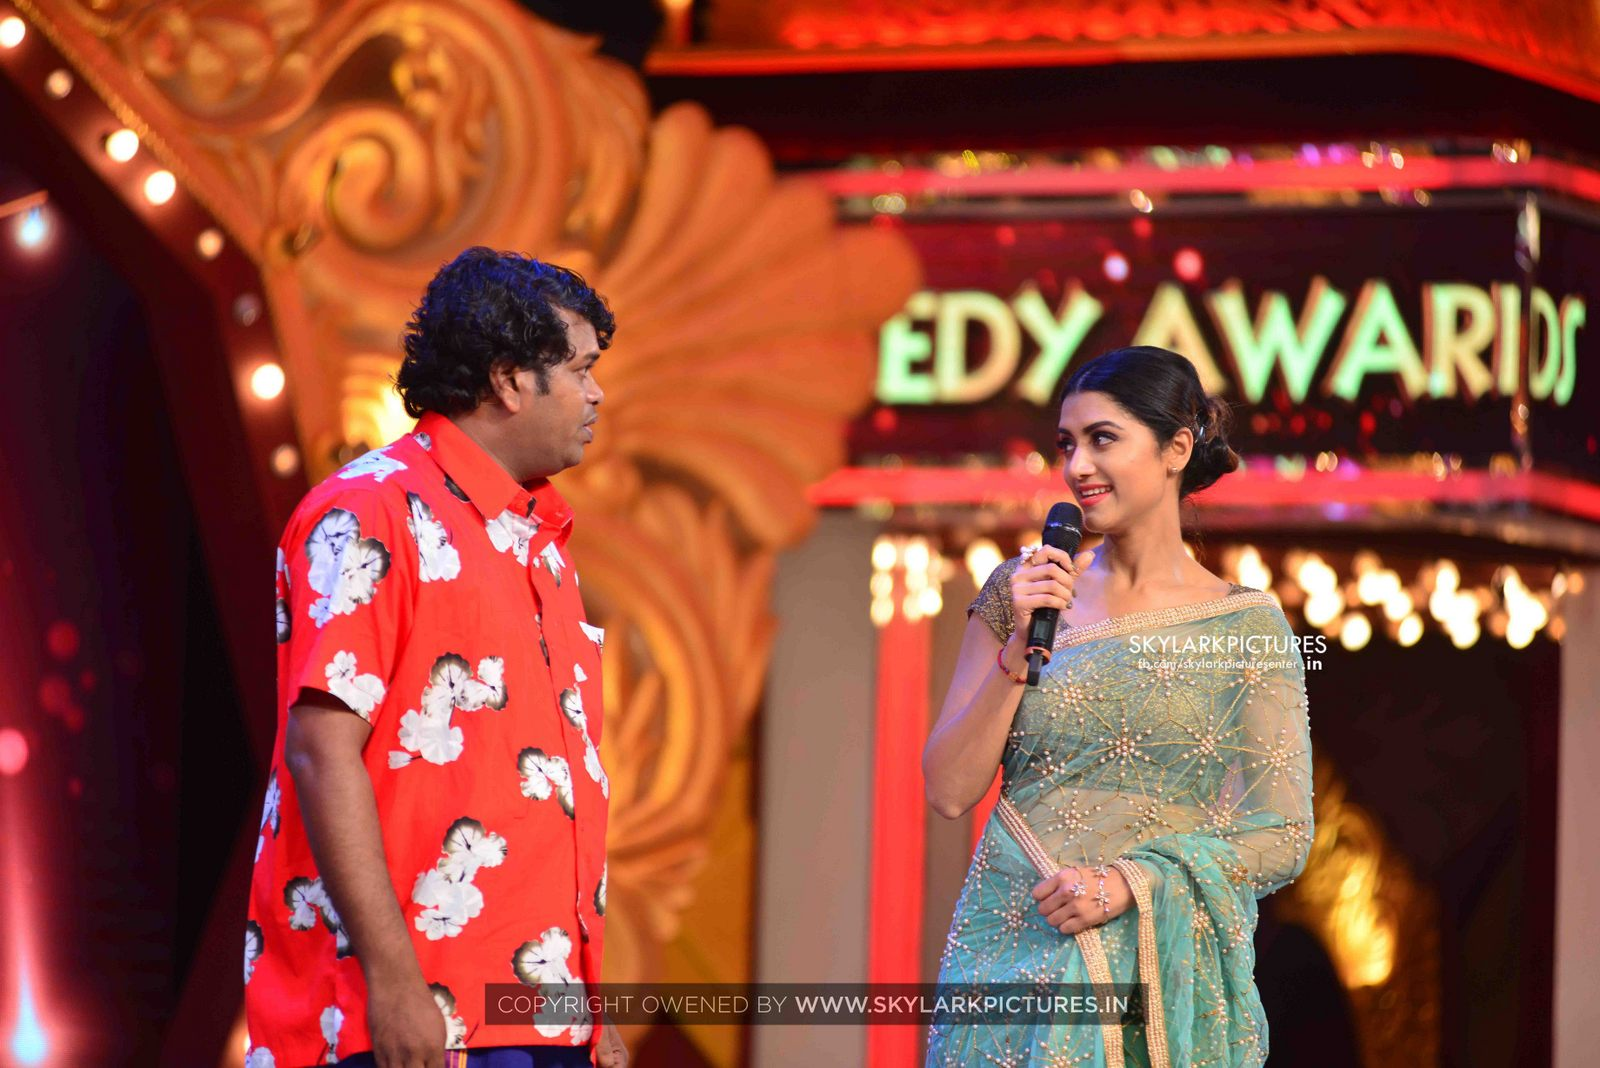 mamtha mohandas latest photos from asia  comedy awards